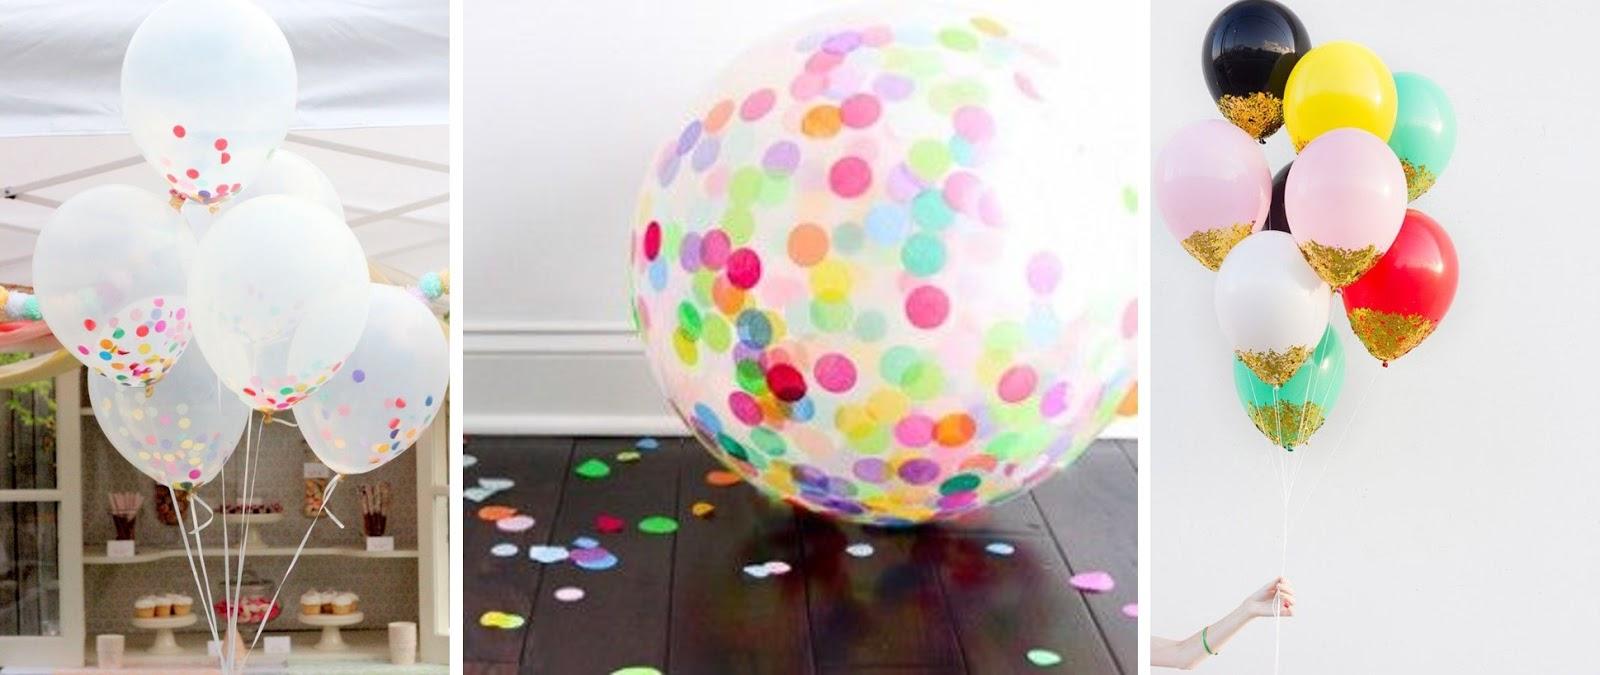 Globos decorados con confetti